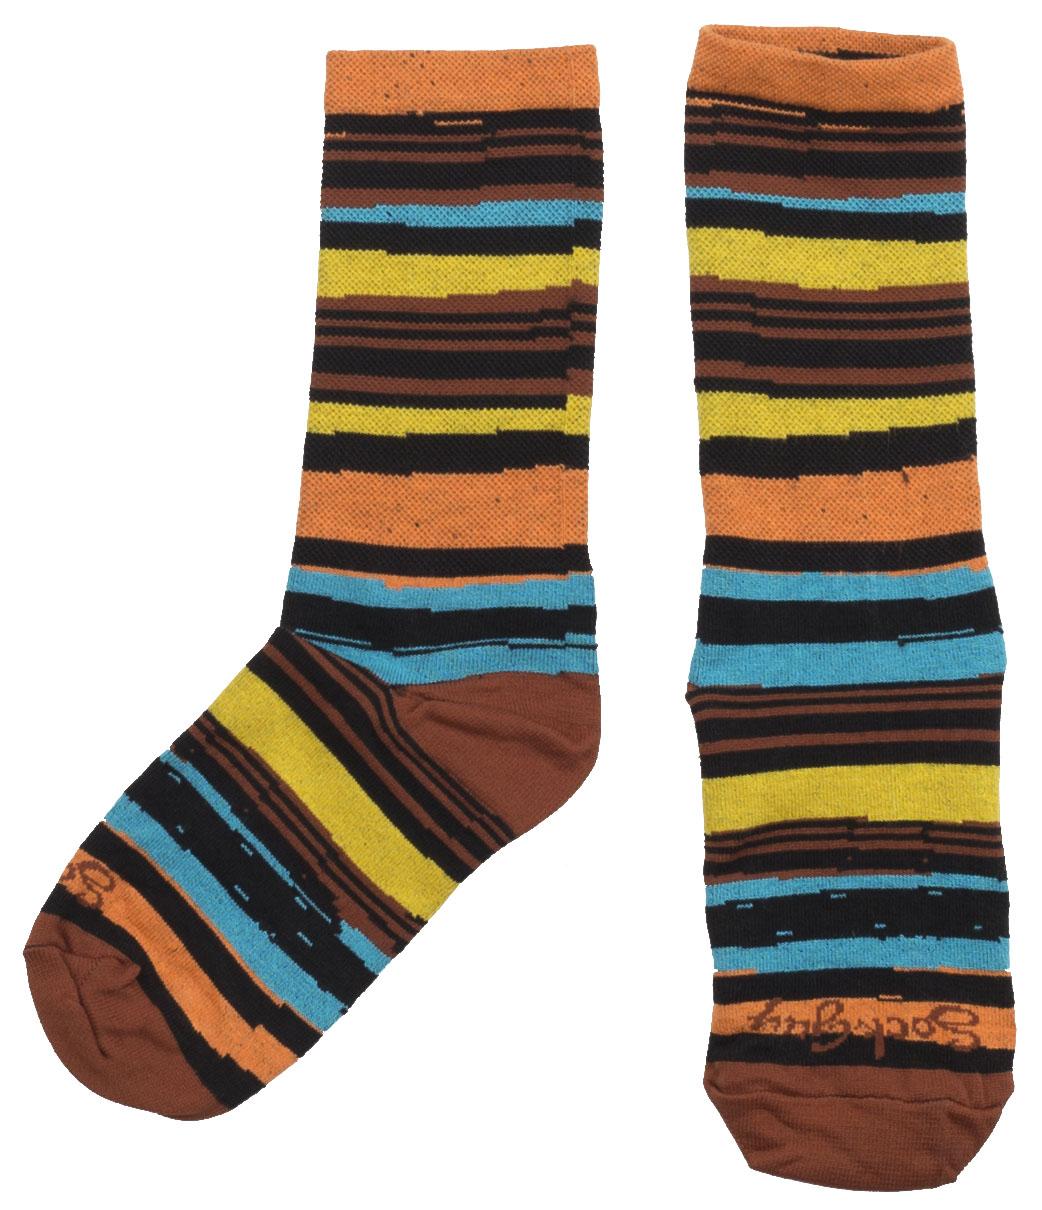 Sockguy Sedona Crew Cycling Socks